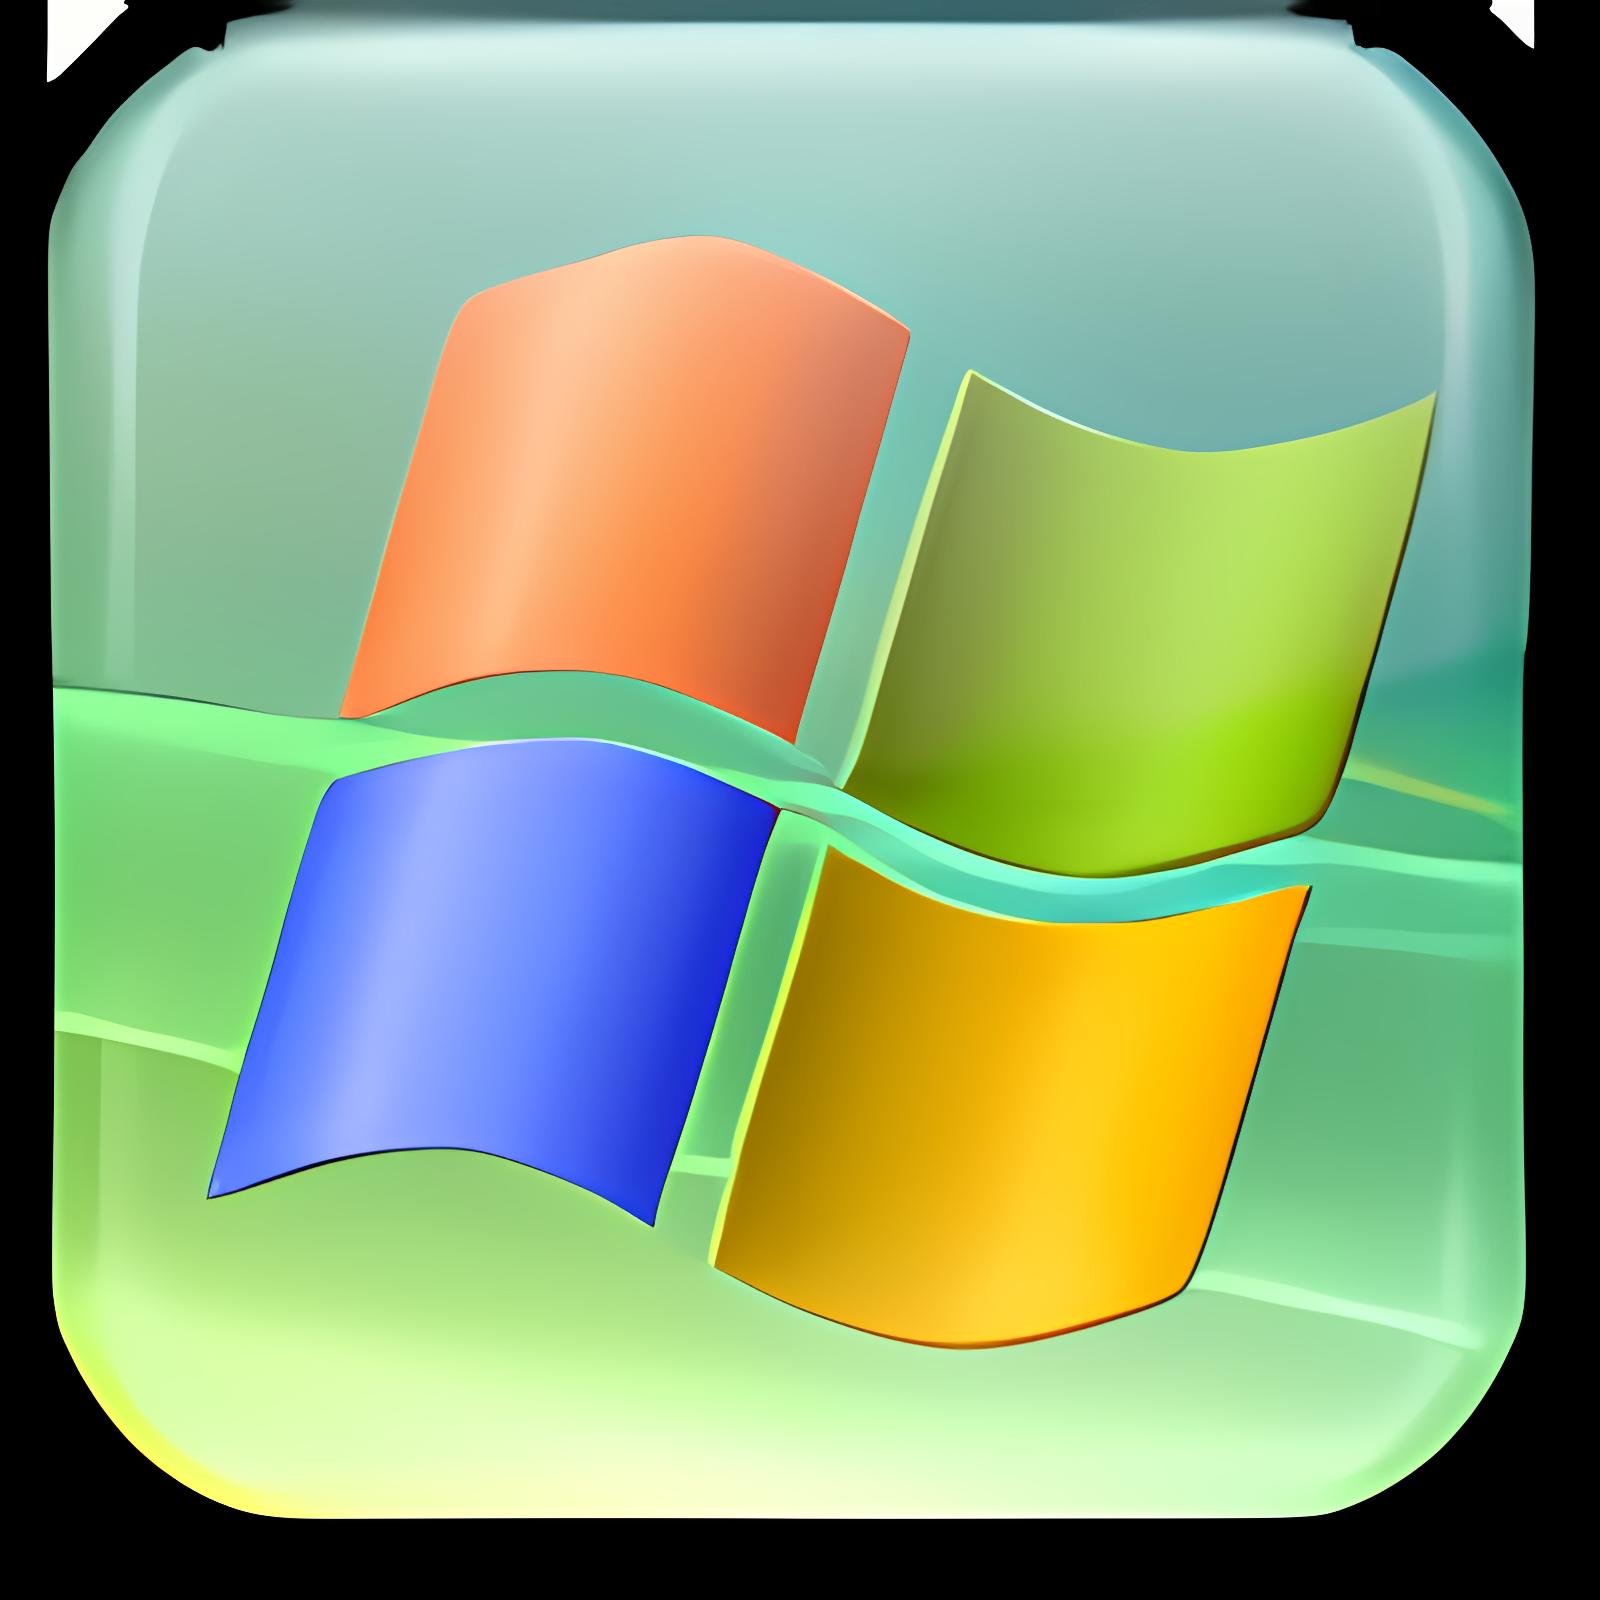 Transform XP to Vista